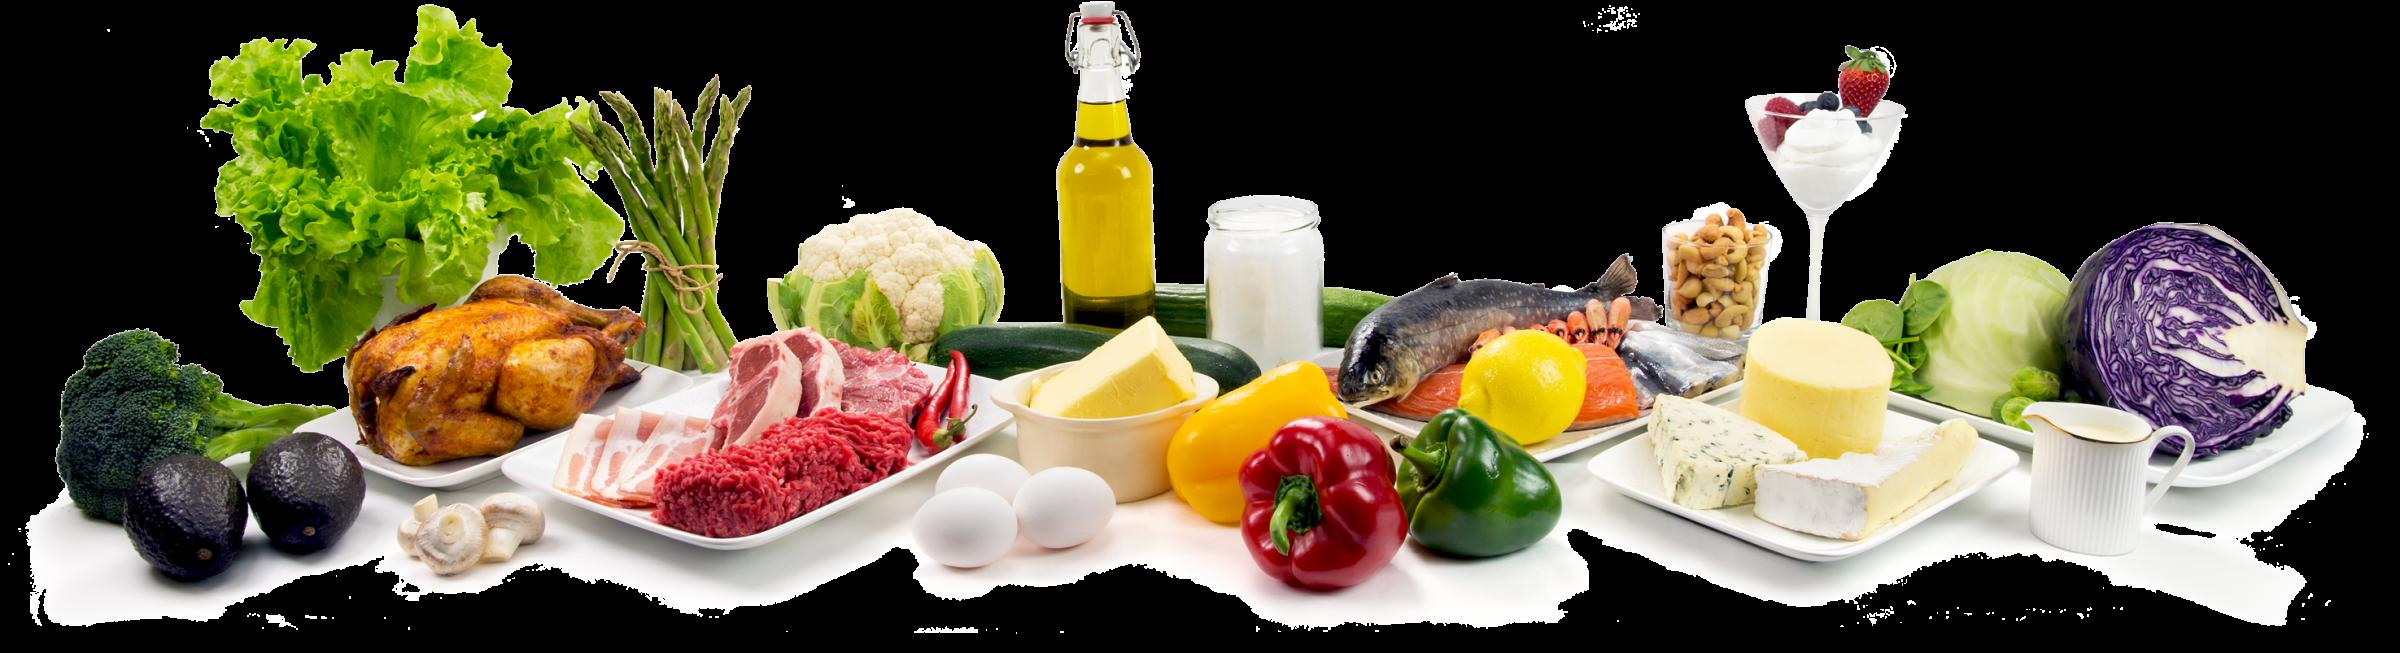 Foods PNG - 33337